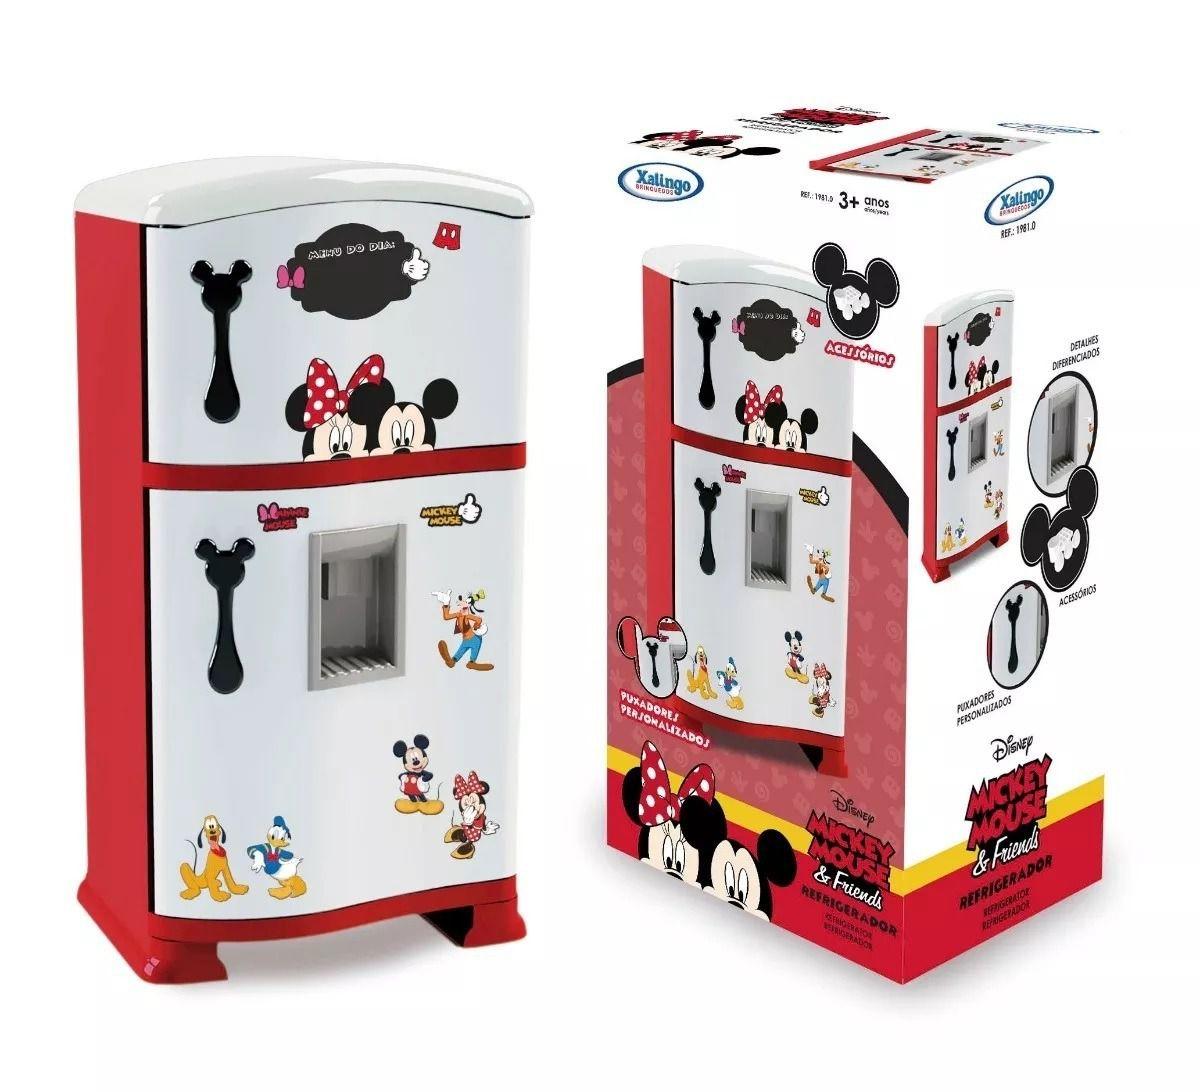 Geladeira Infantil Mickey Mouse Duplex 50 cm - Xalingo